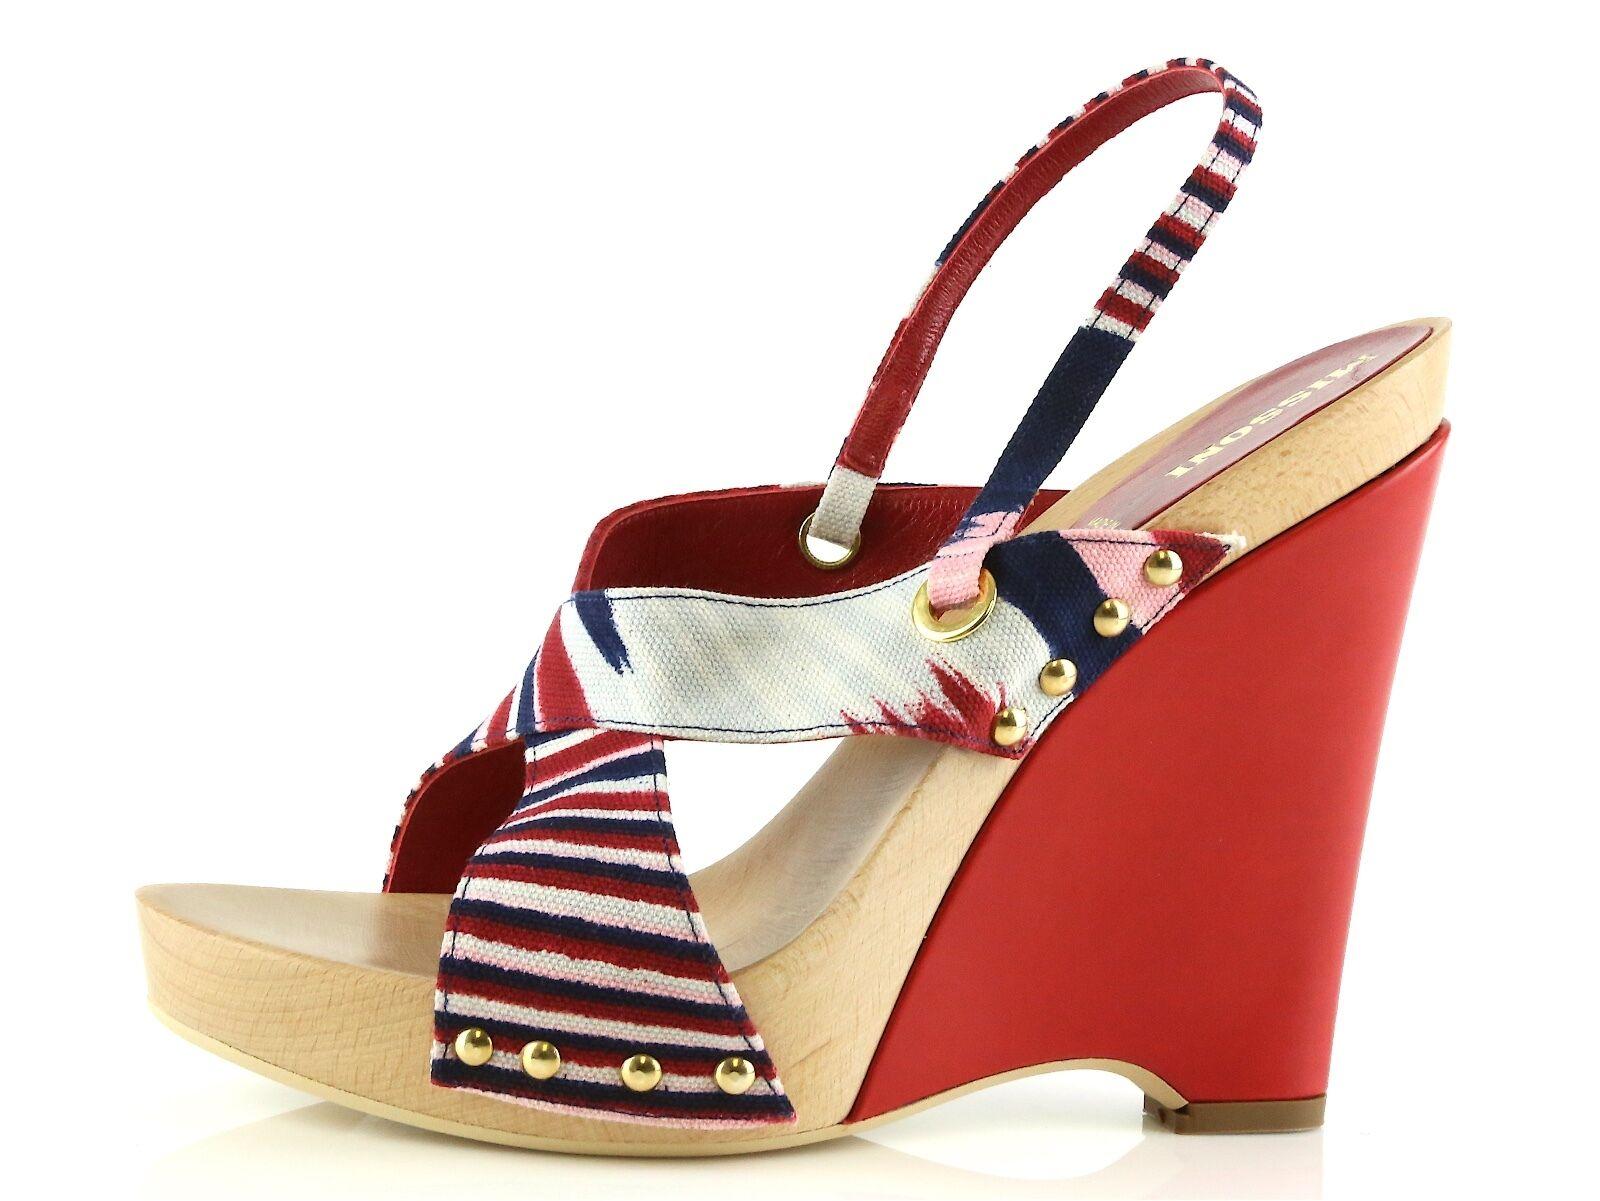 MISSONI OLONA Red Striped Wedge Heels 8967 Size 40 EU   495 New